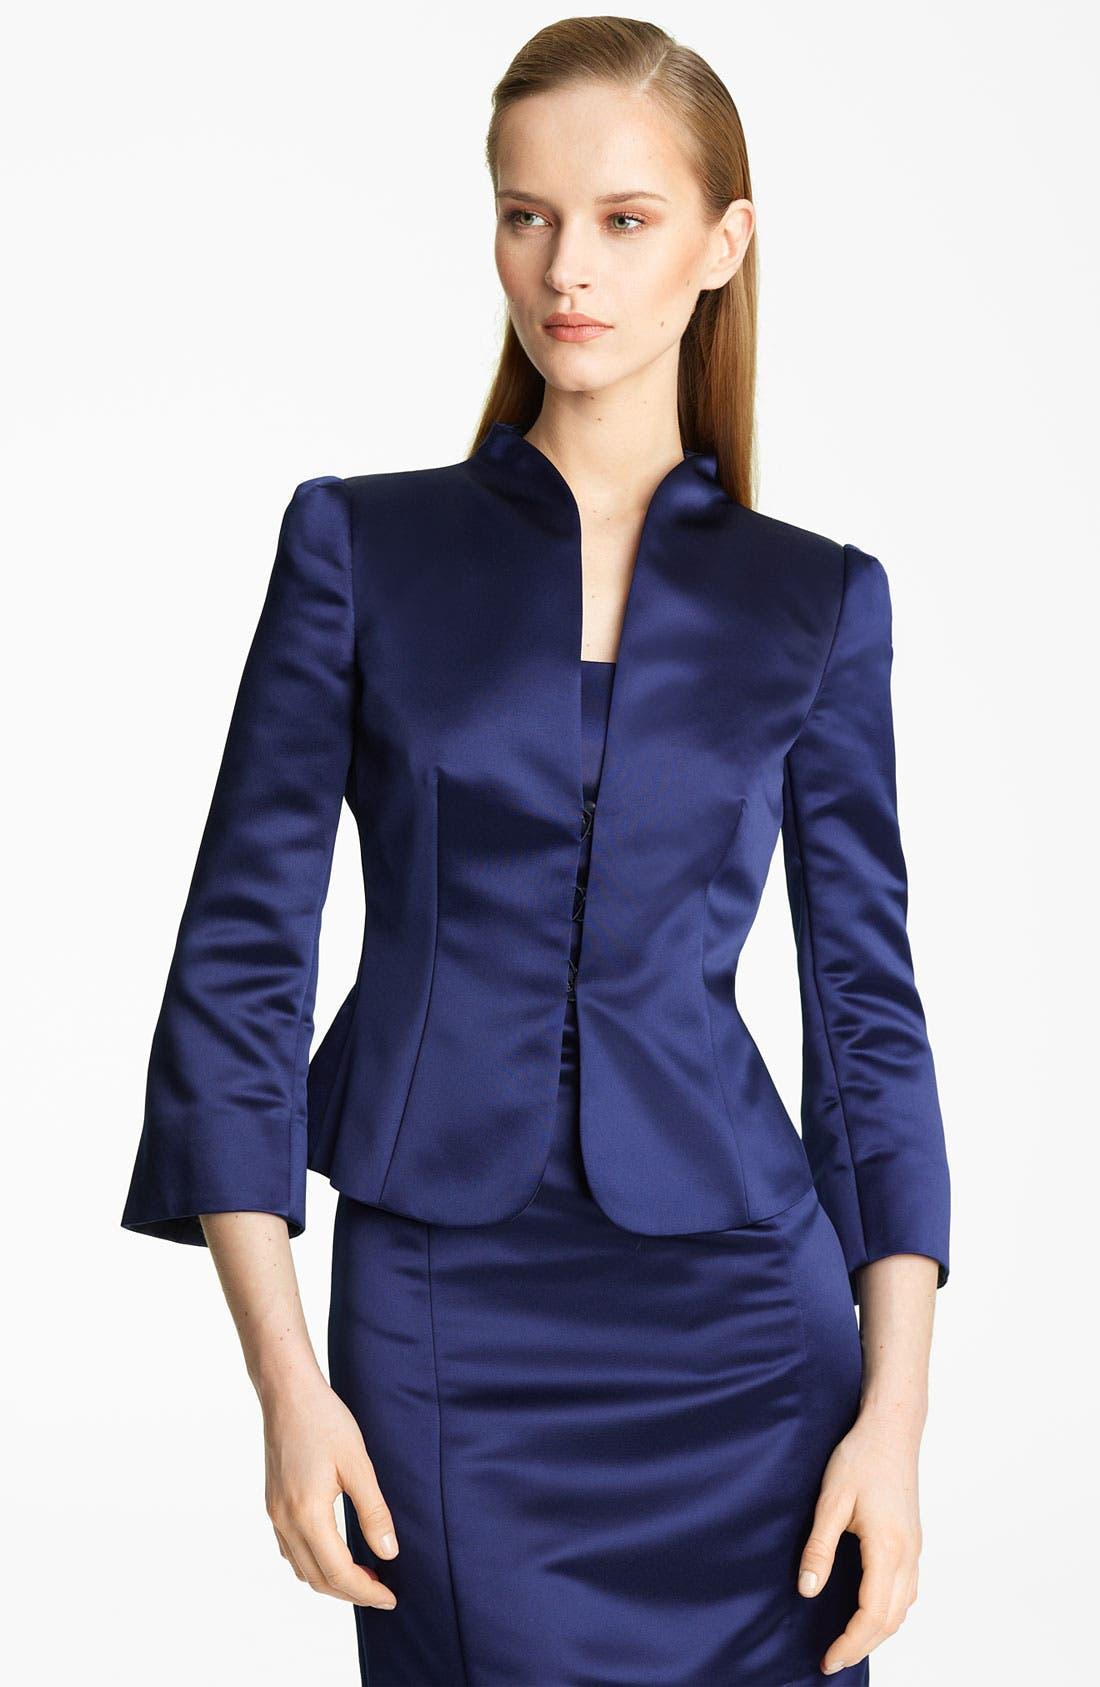 Main Image - Armani Collezioni Duchesse Satin Jacket